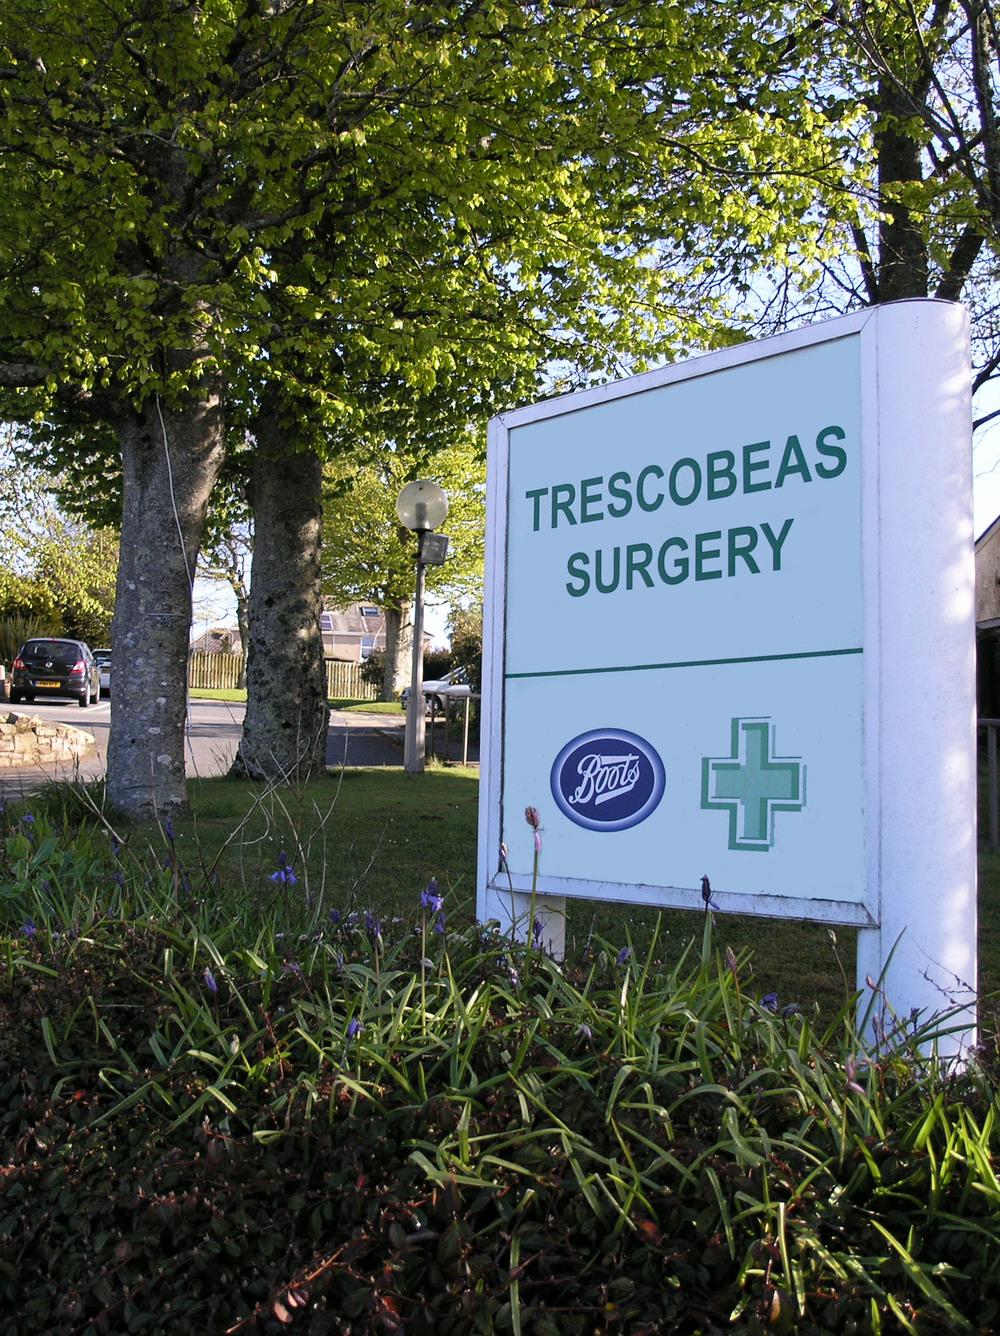 Trescobeas Surgery